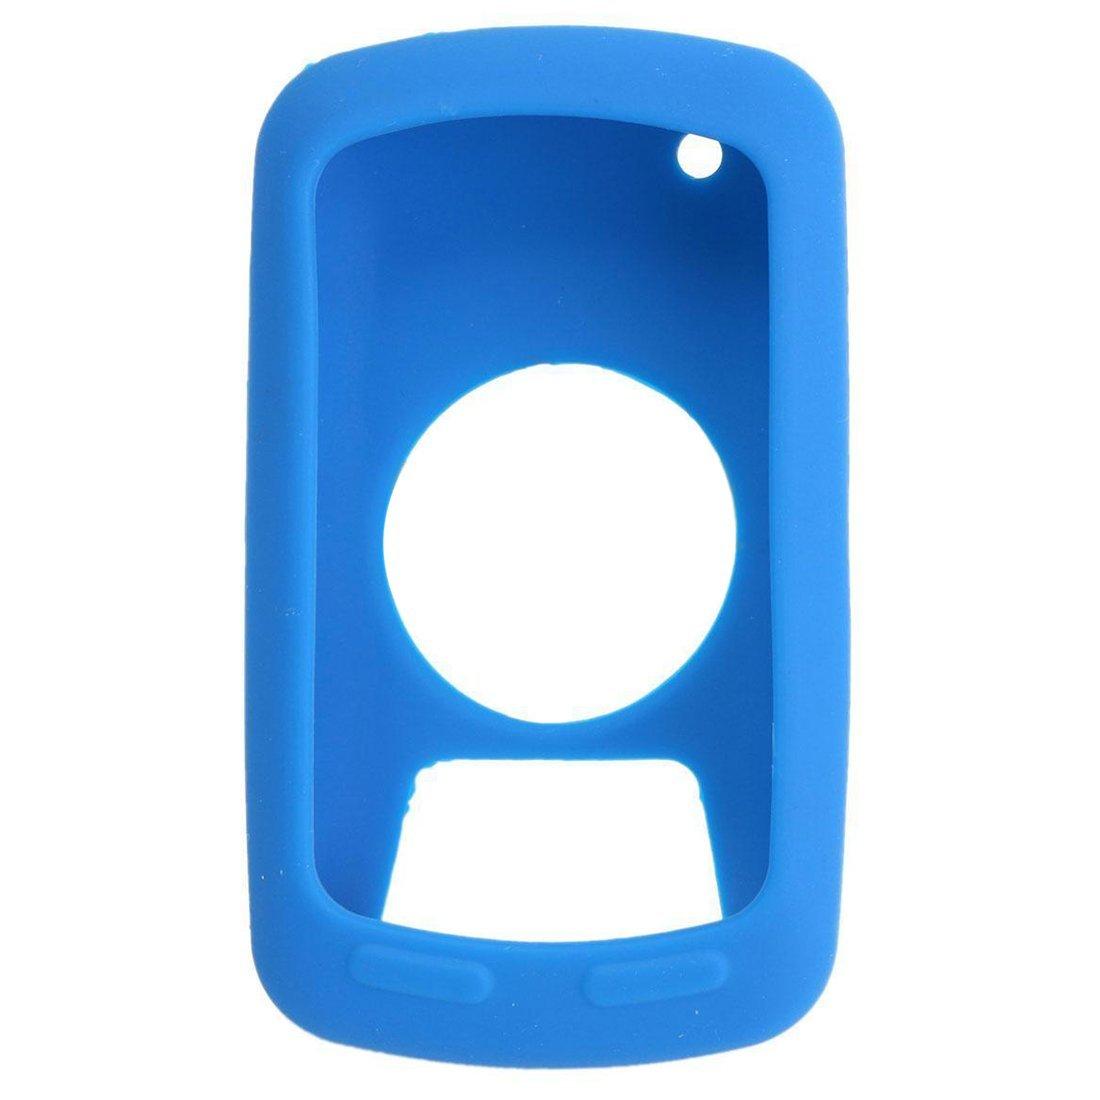 Protective Case - TOOGOO(R)Silicone Bag Protective Case Cover Shell for Garmin 800 810 Edge Color: Blue